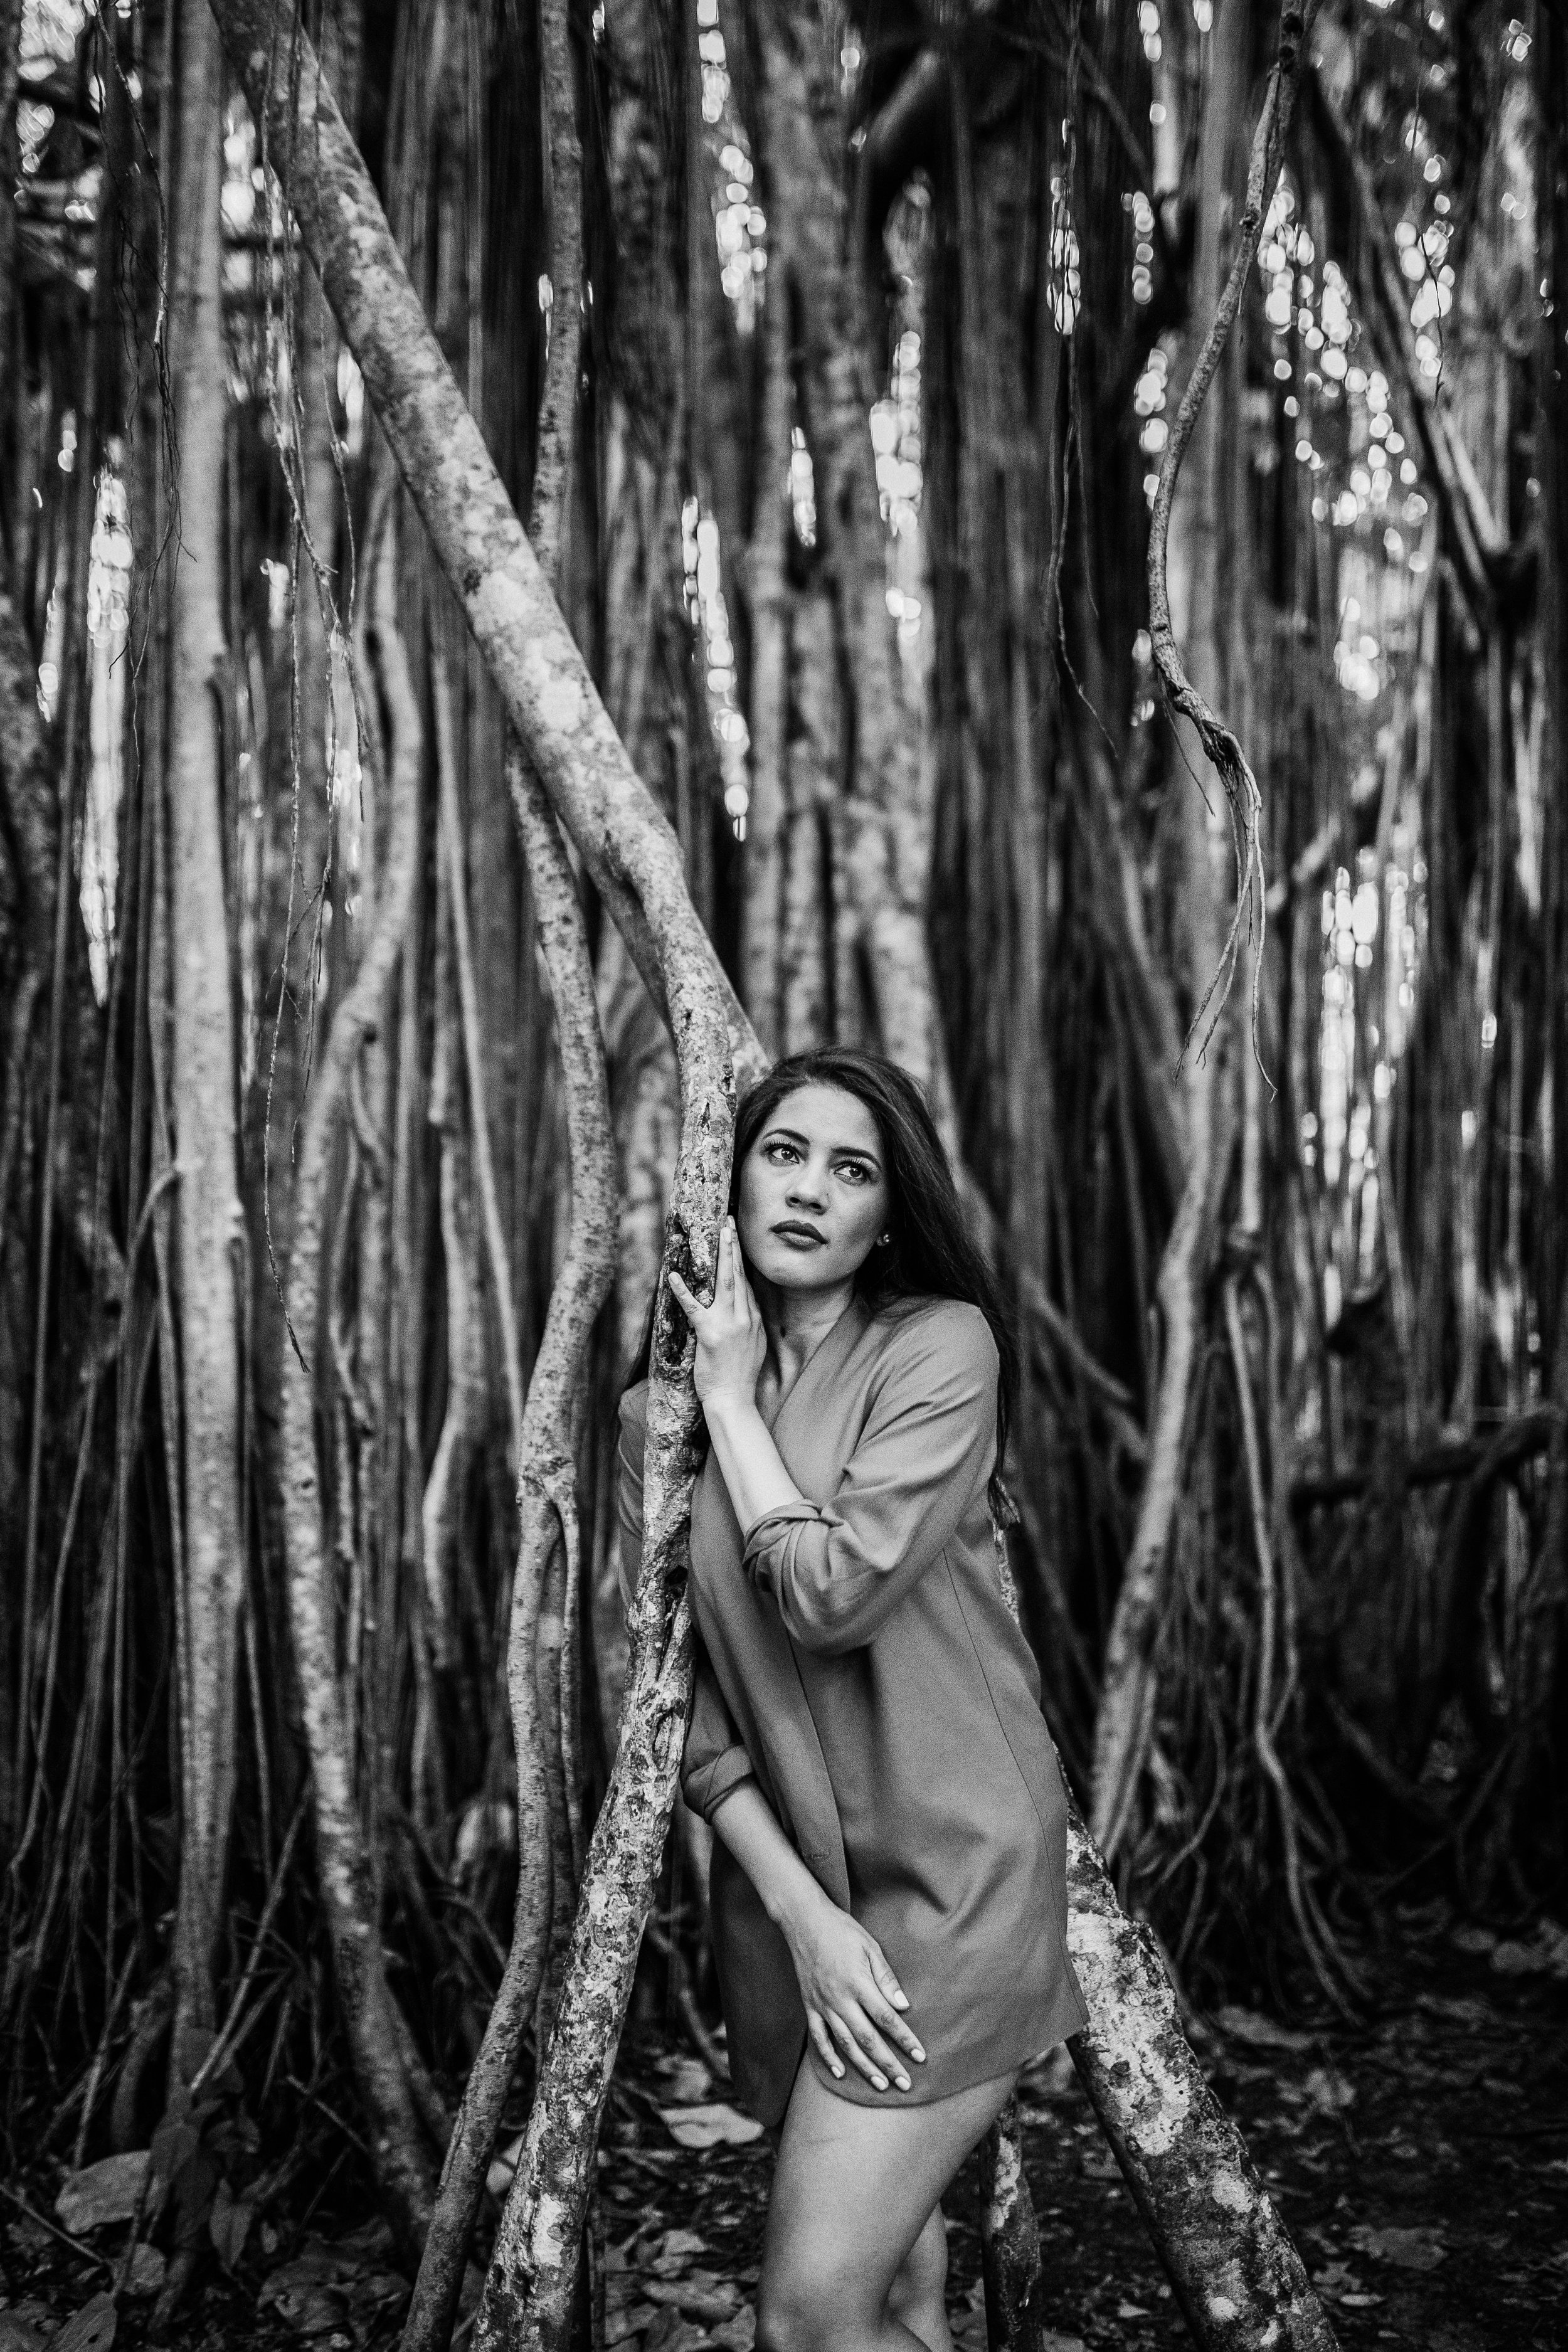 Tree Tops Park, Davie FL